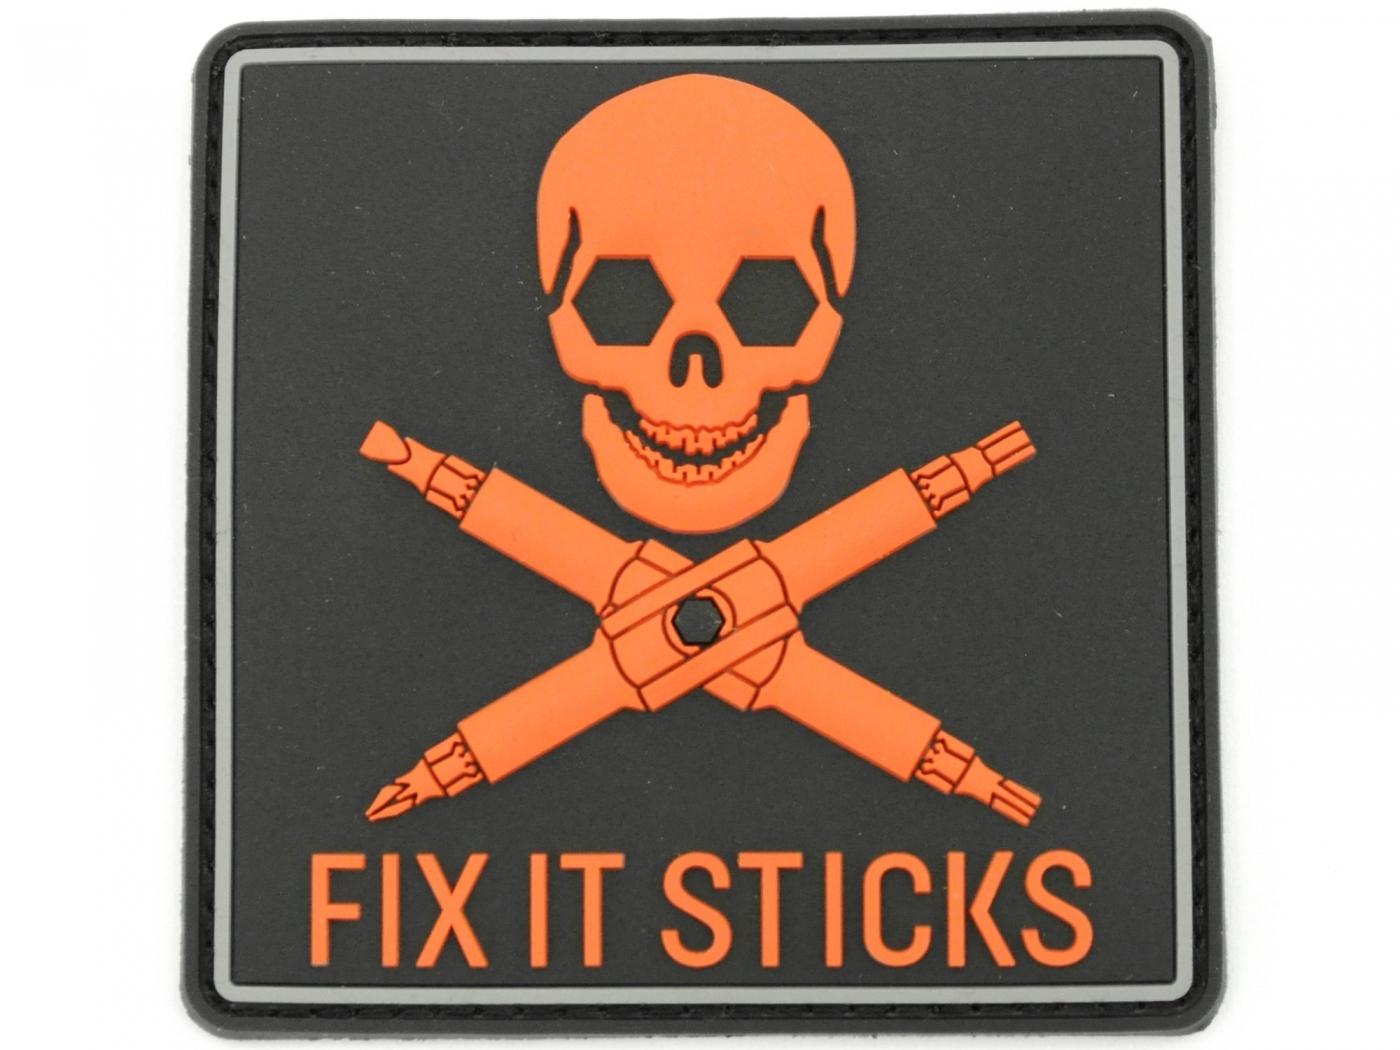 FIX IT STICKS PVC PATCH -